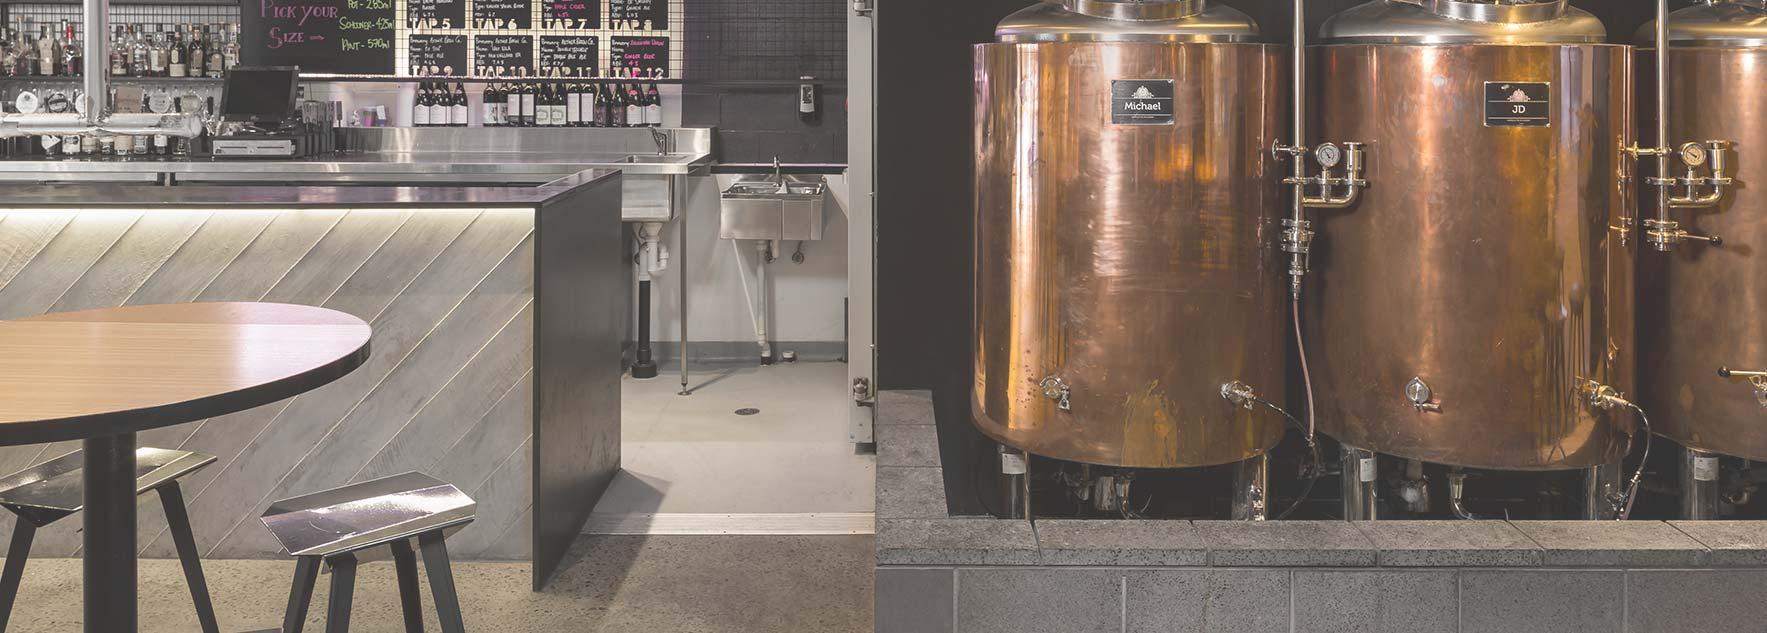 mi aether brewery